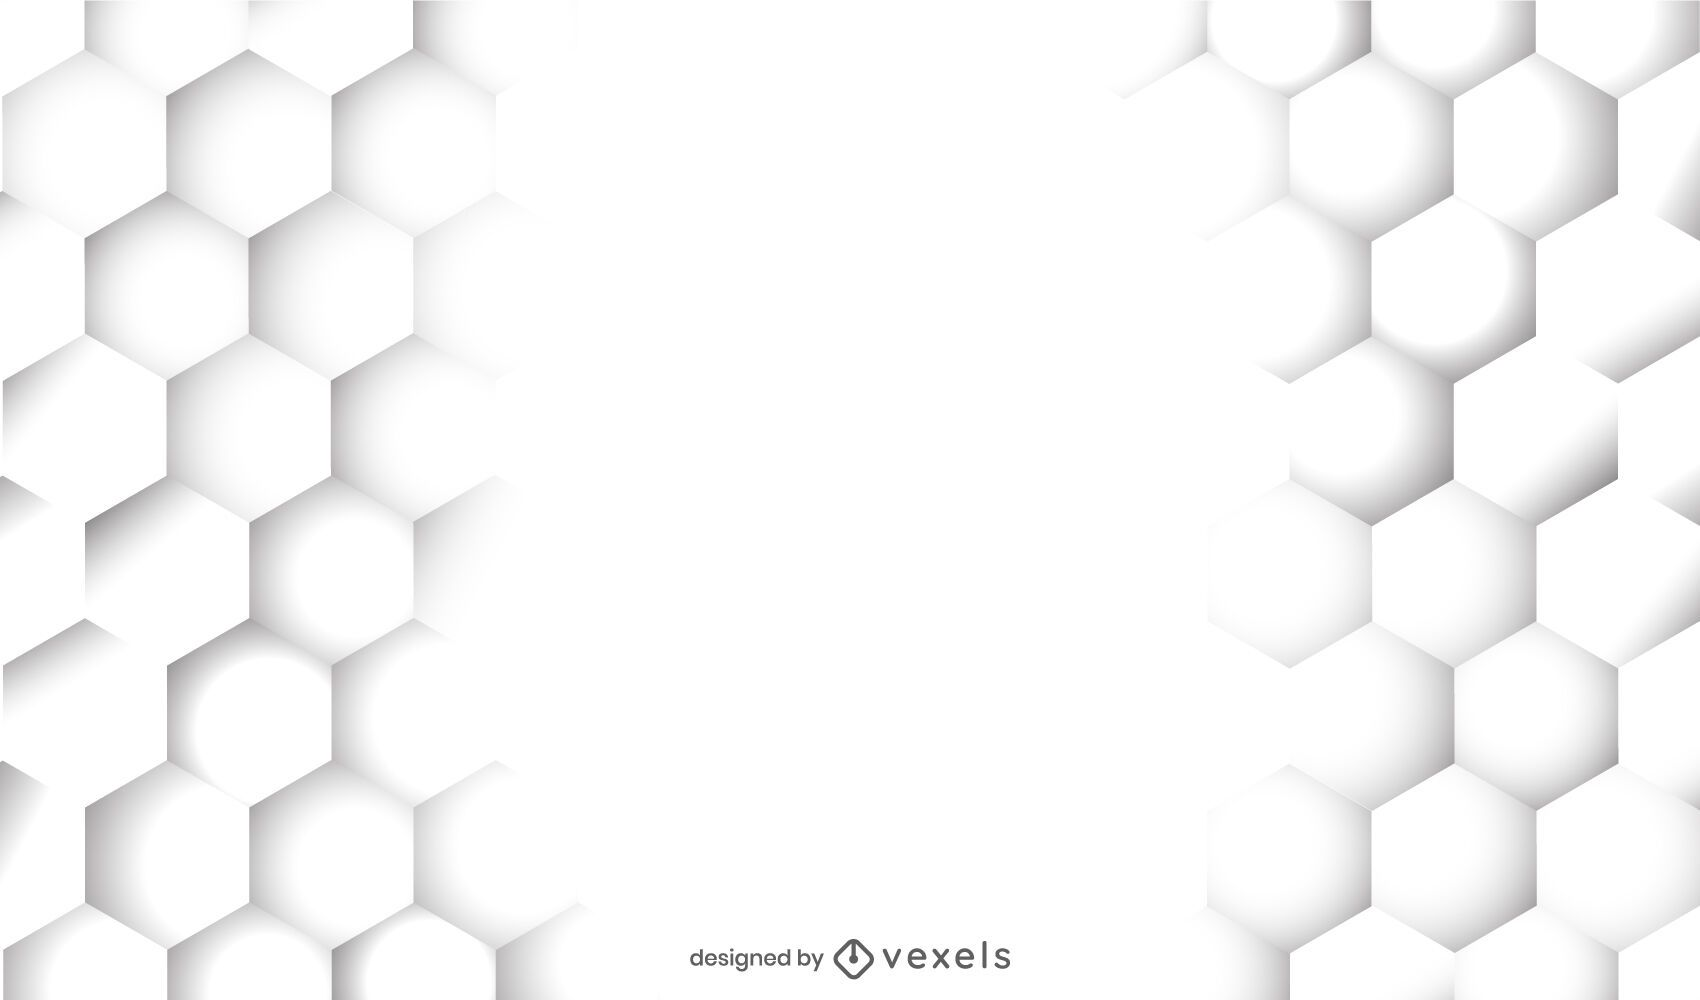 Honeycomb white background design